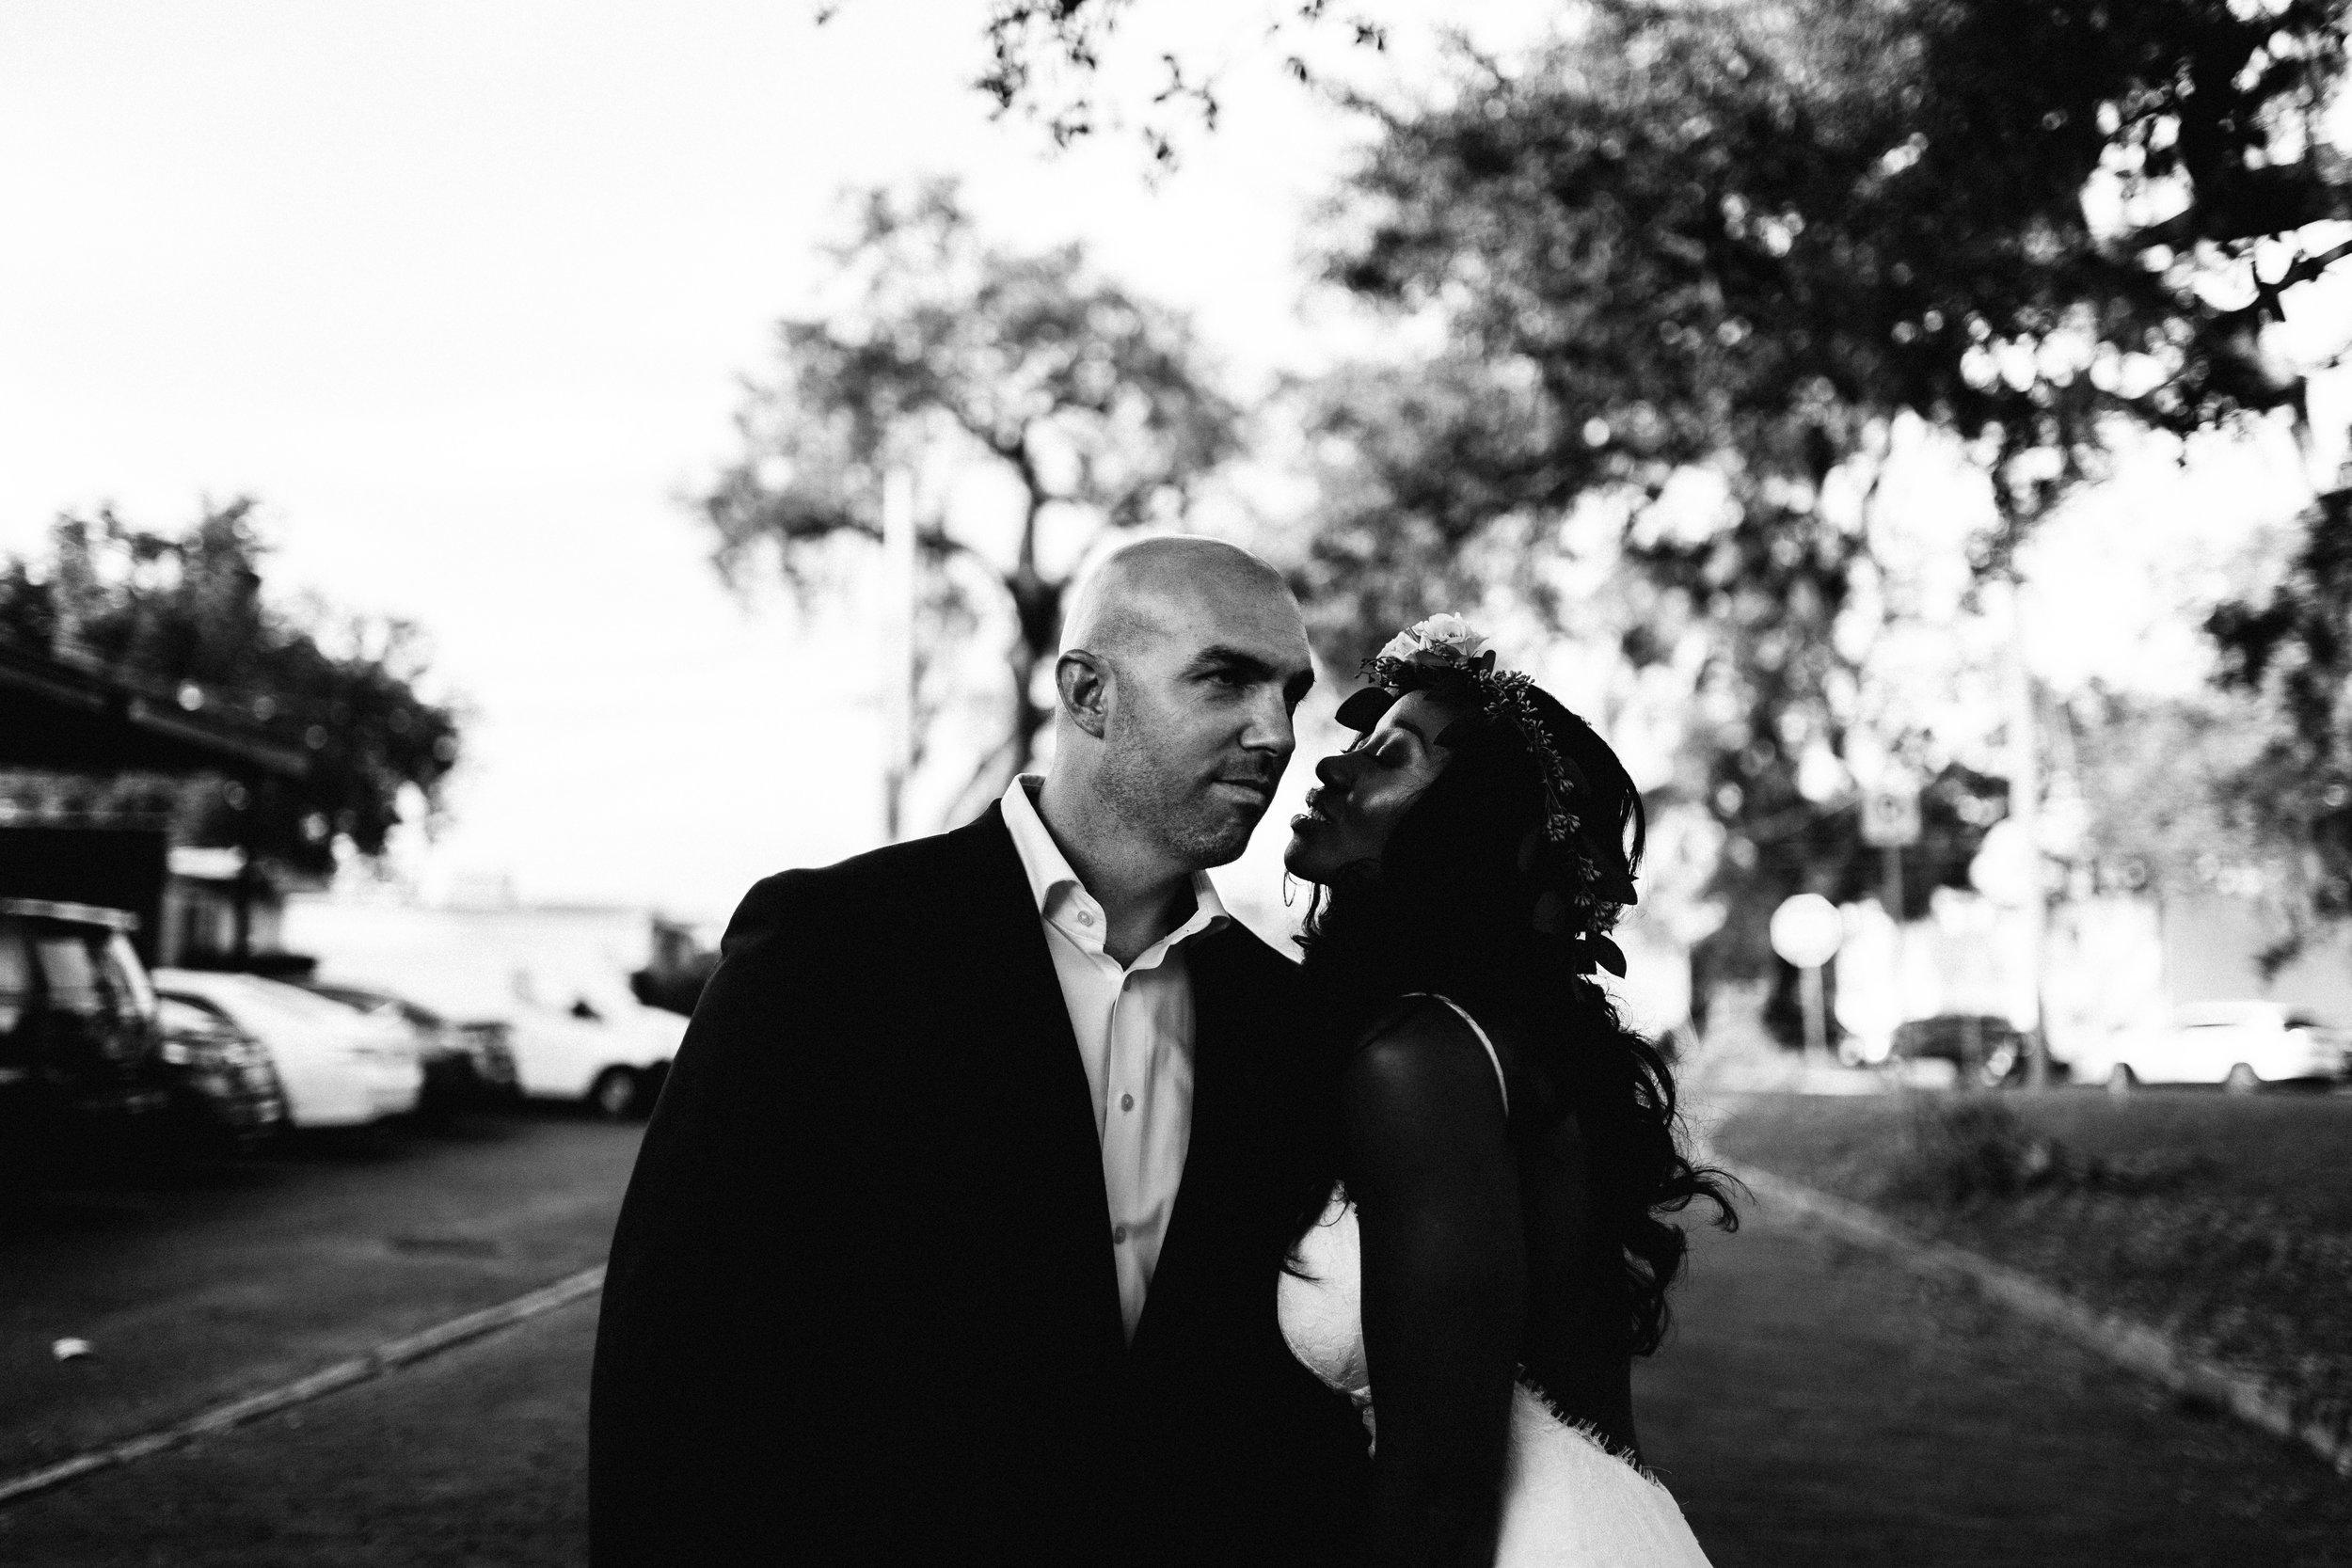 2017.09.16 Ashley and Chuck O'Day Quantam Leap Winery Wedding (413 of 462).jpg